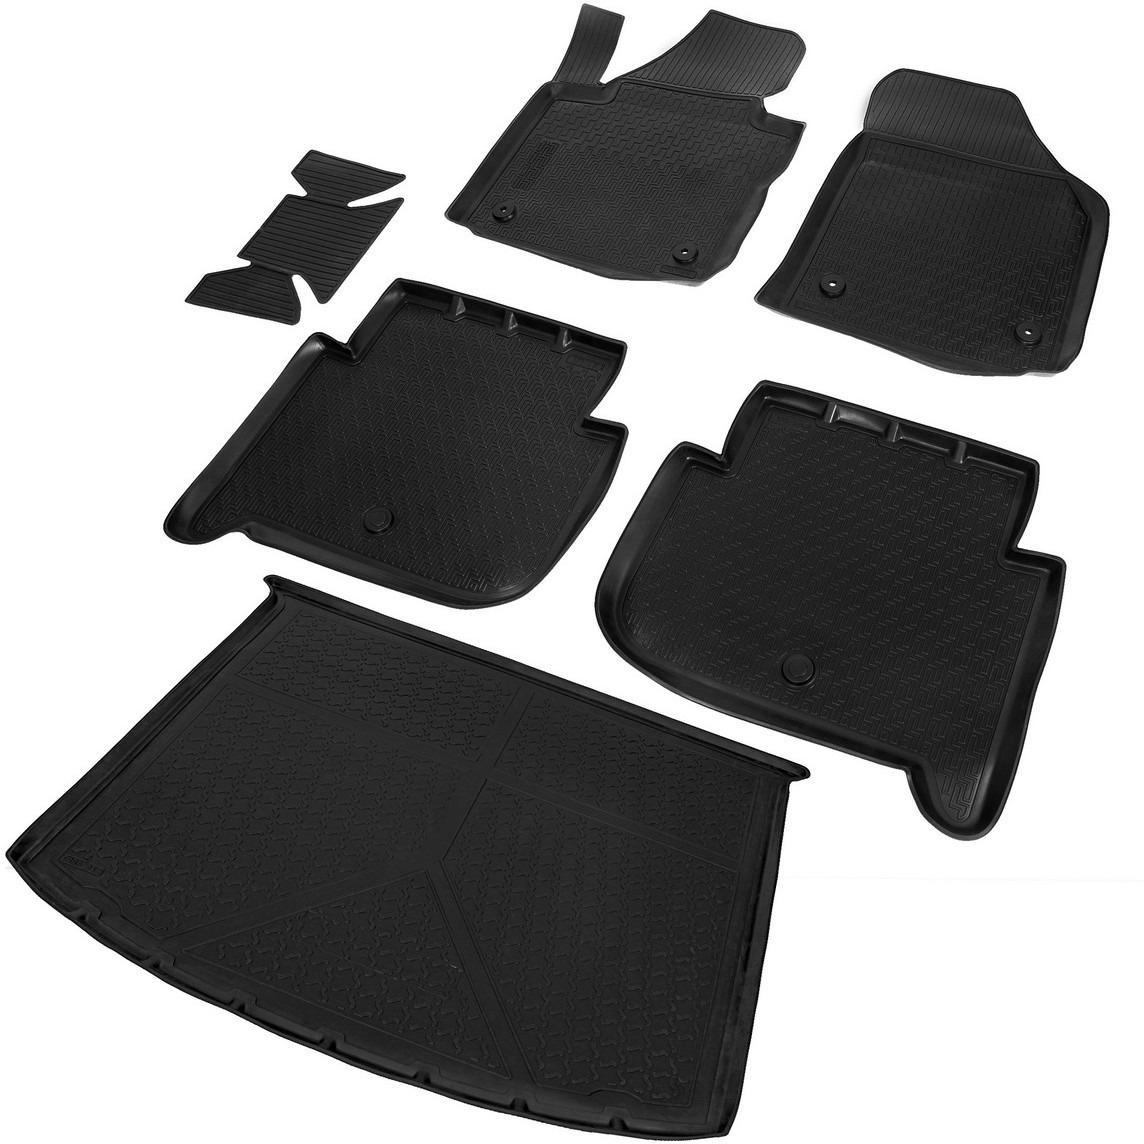 Комплект ковриков салона и багажника Rival для Volkswagen Touran II компактвэн 2010-2015, полиуретан, с крепежом, с перемычкой, 6 шт. K15806003-1 комплект ковриков салона и багажника rival для volkswagen jetta 2010 н в полиуретан k15802001 2